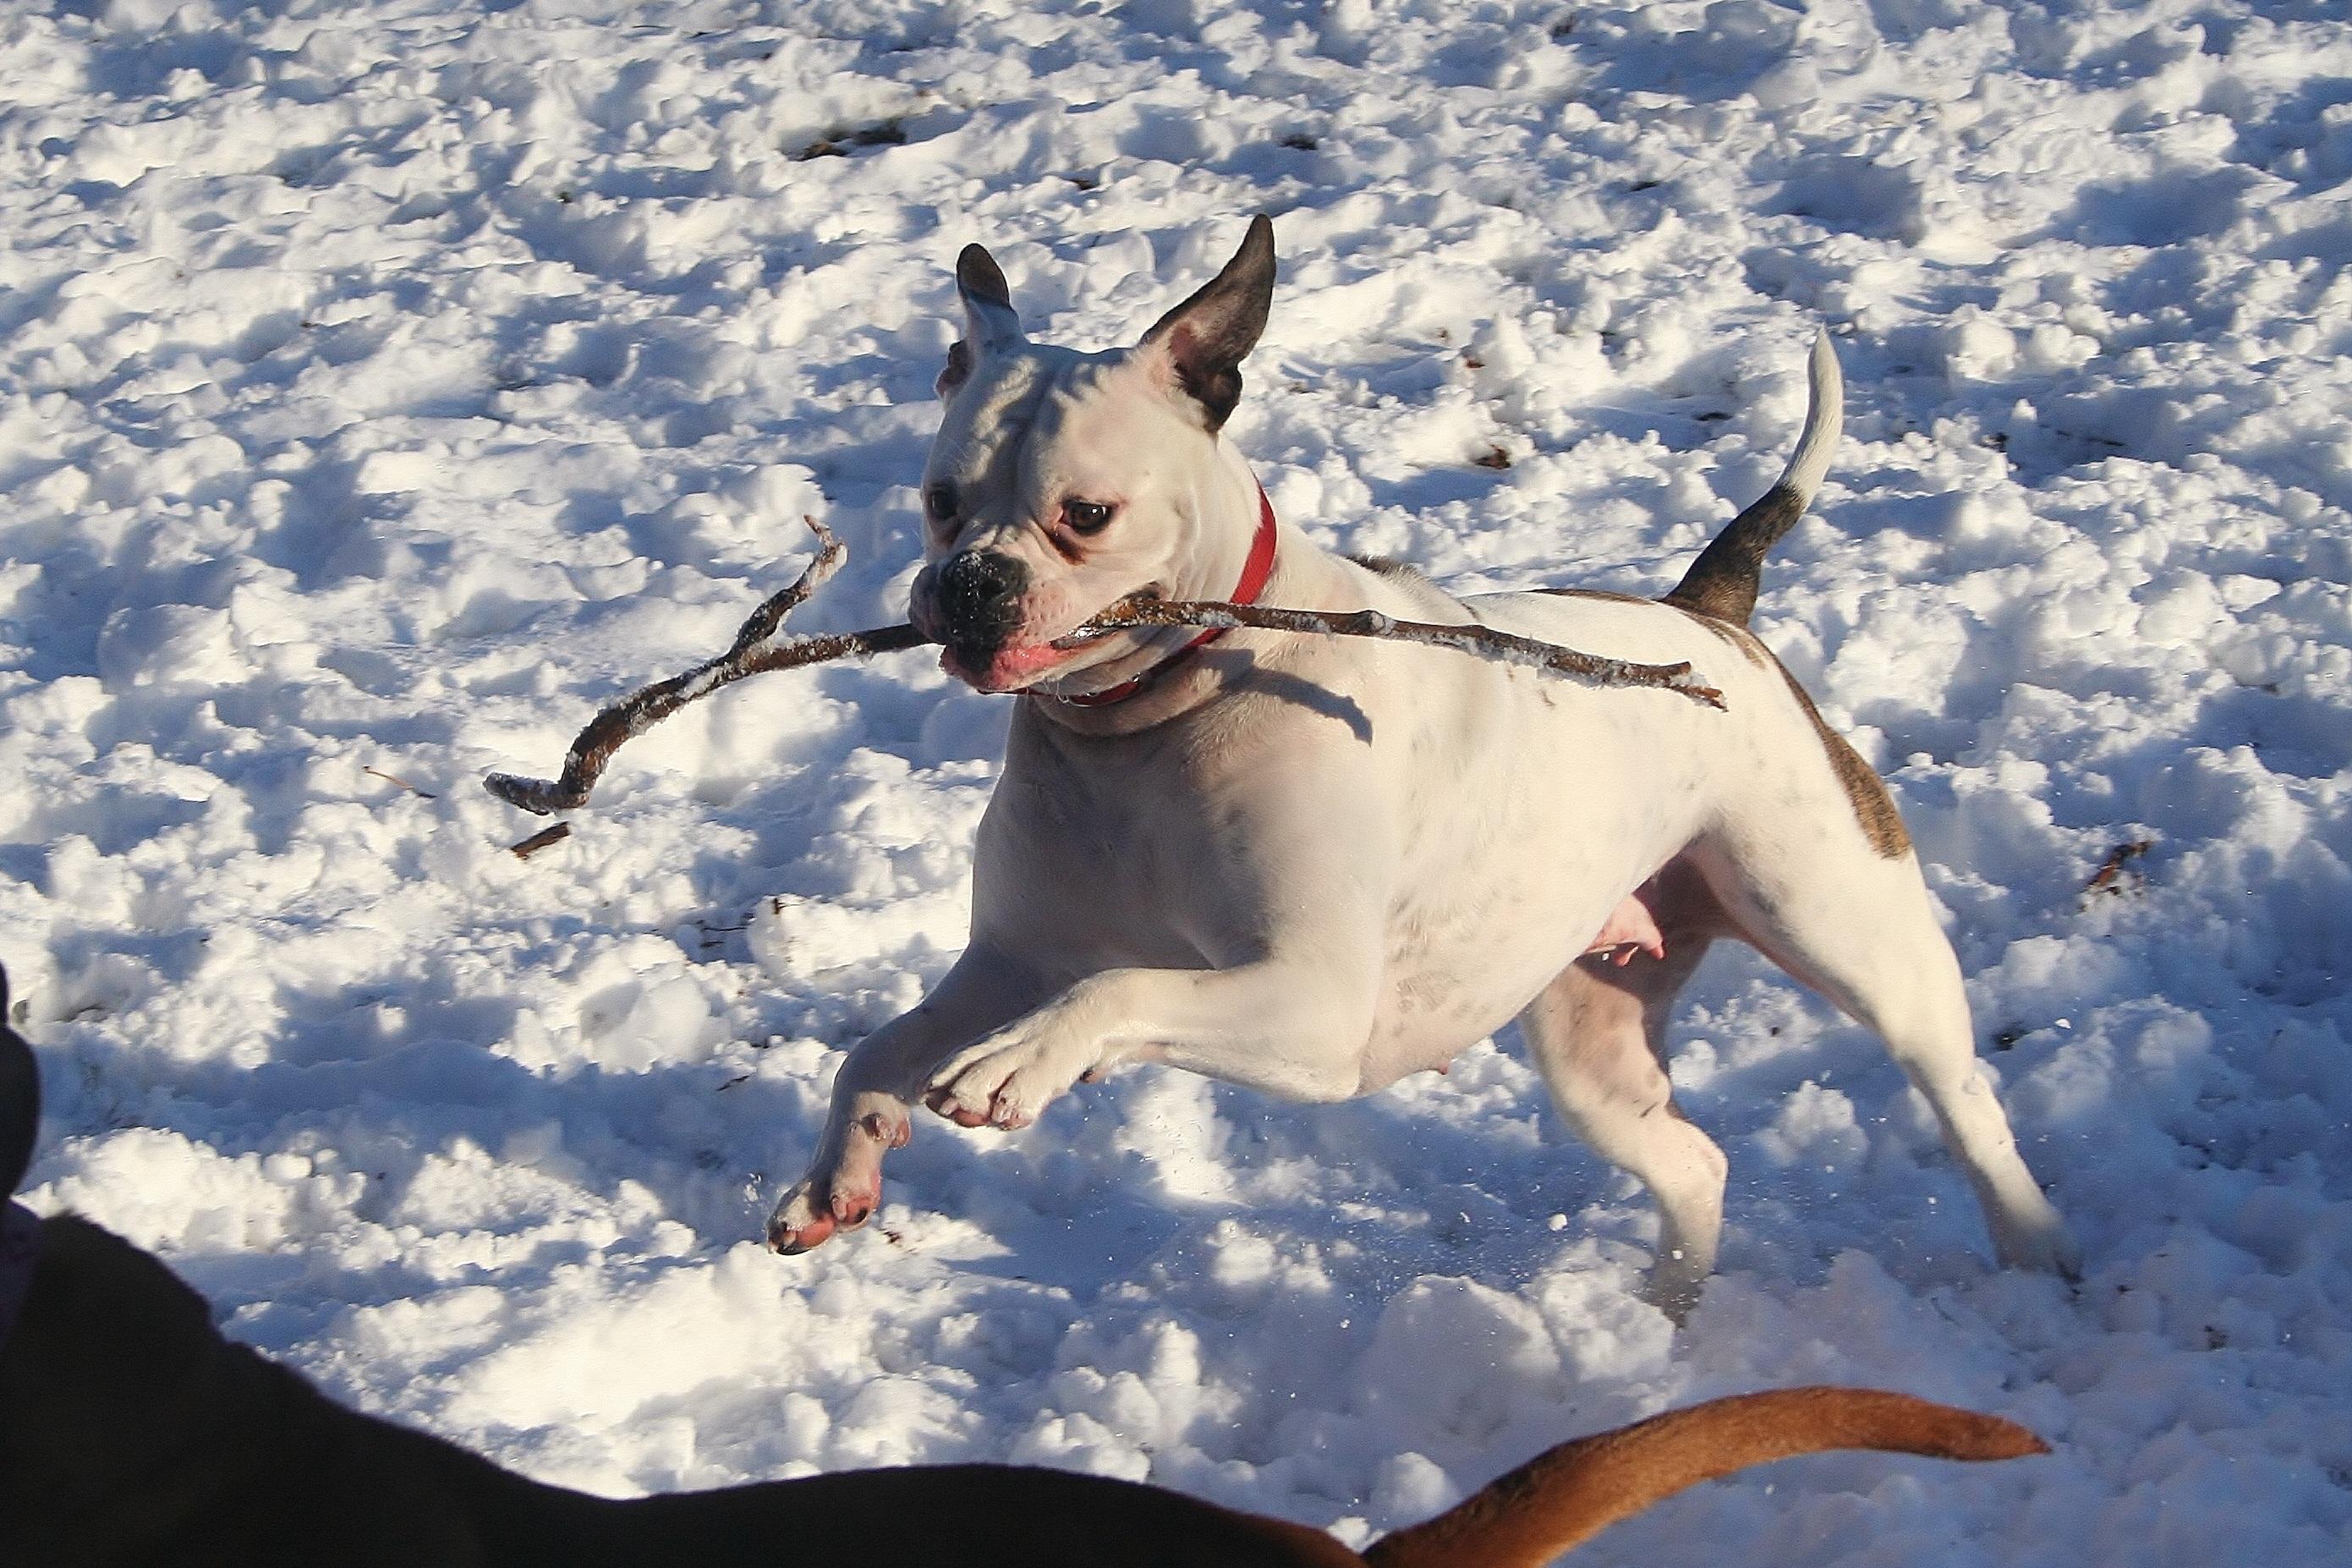 Wonderful Bulldog Canine Adorable Dog - snow-winter-running-dog-canine-pet-mammal-playing-season-vertebrate-domestic-adorable-stick-trained-dog-like-mammal-american-bulldog-733589  Image_229743  .jpg